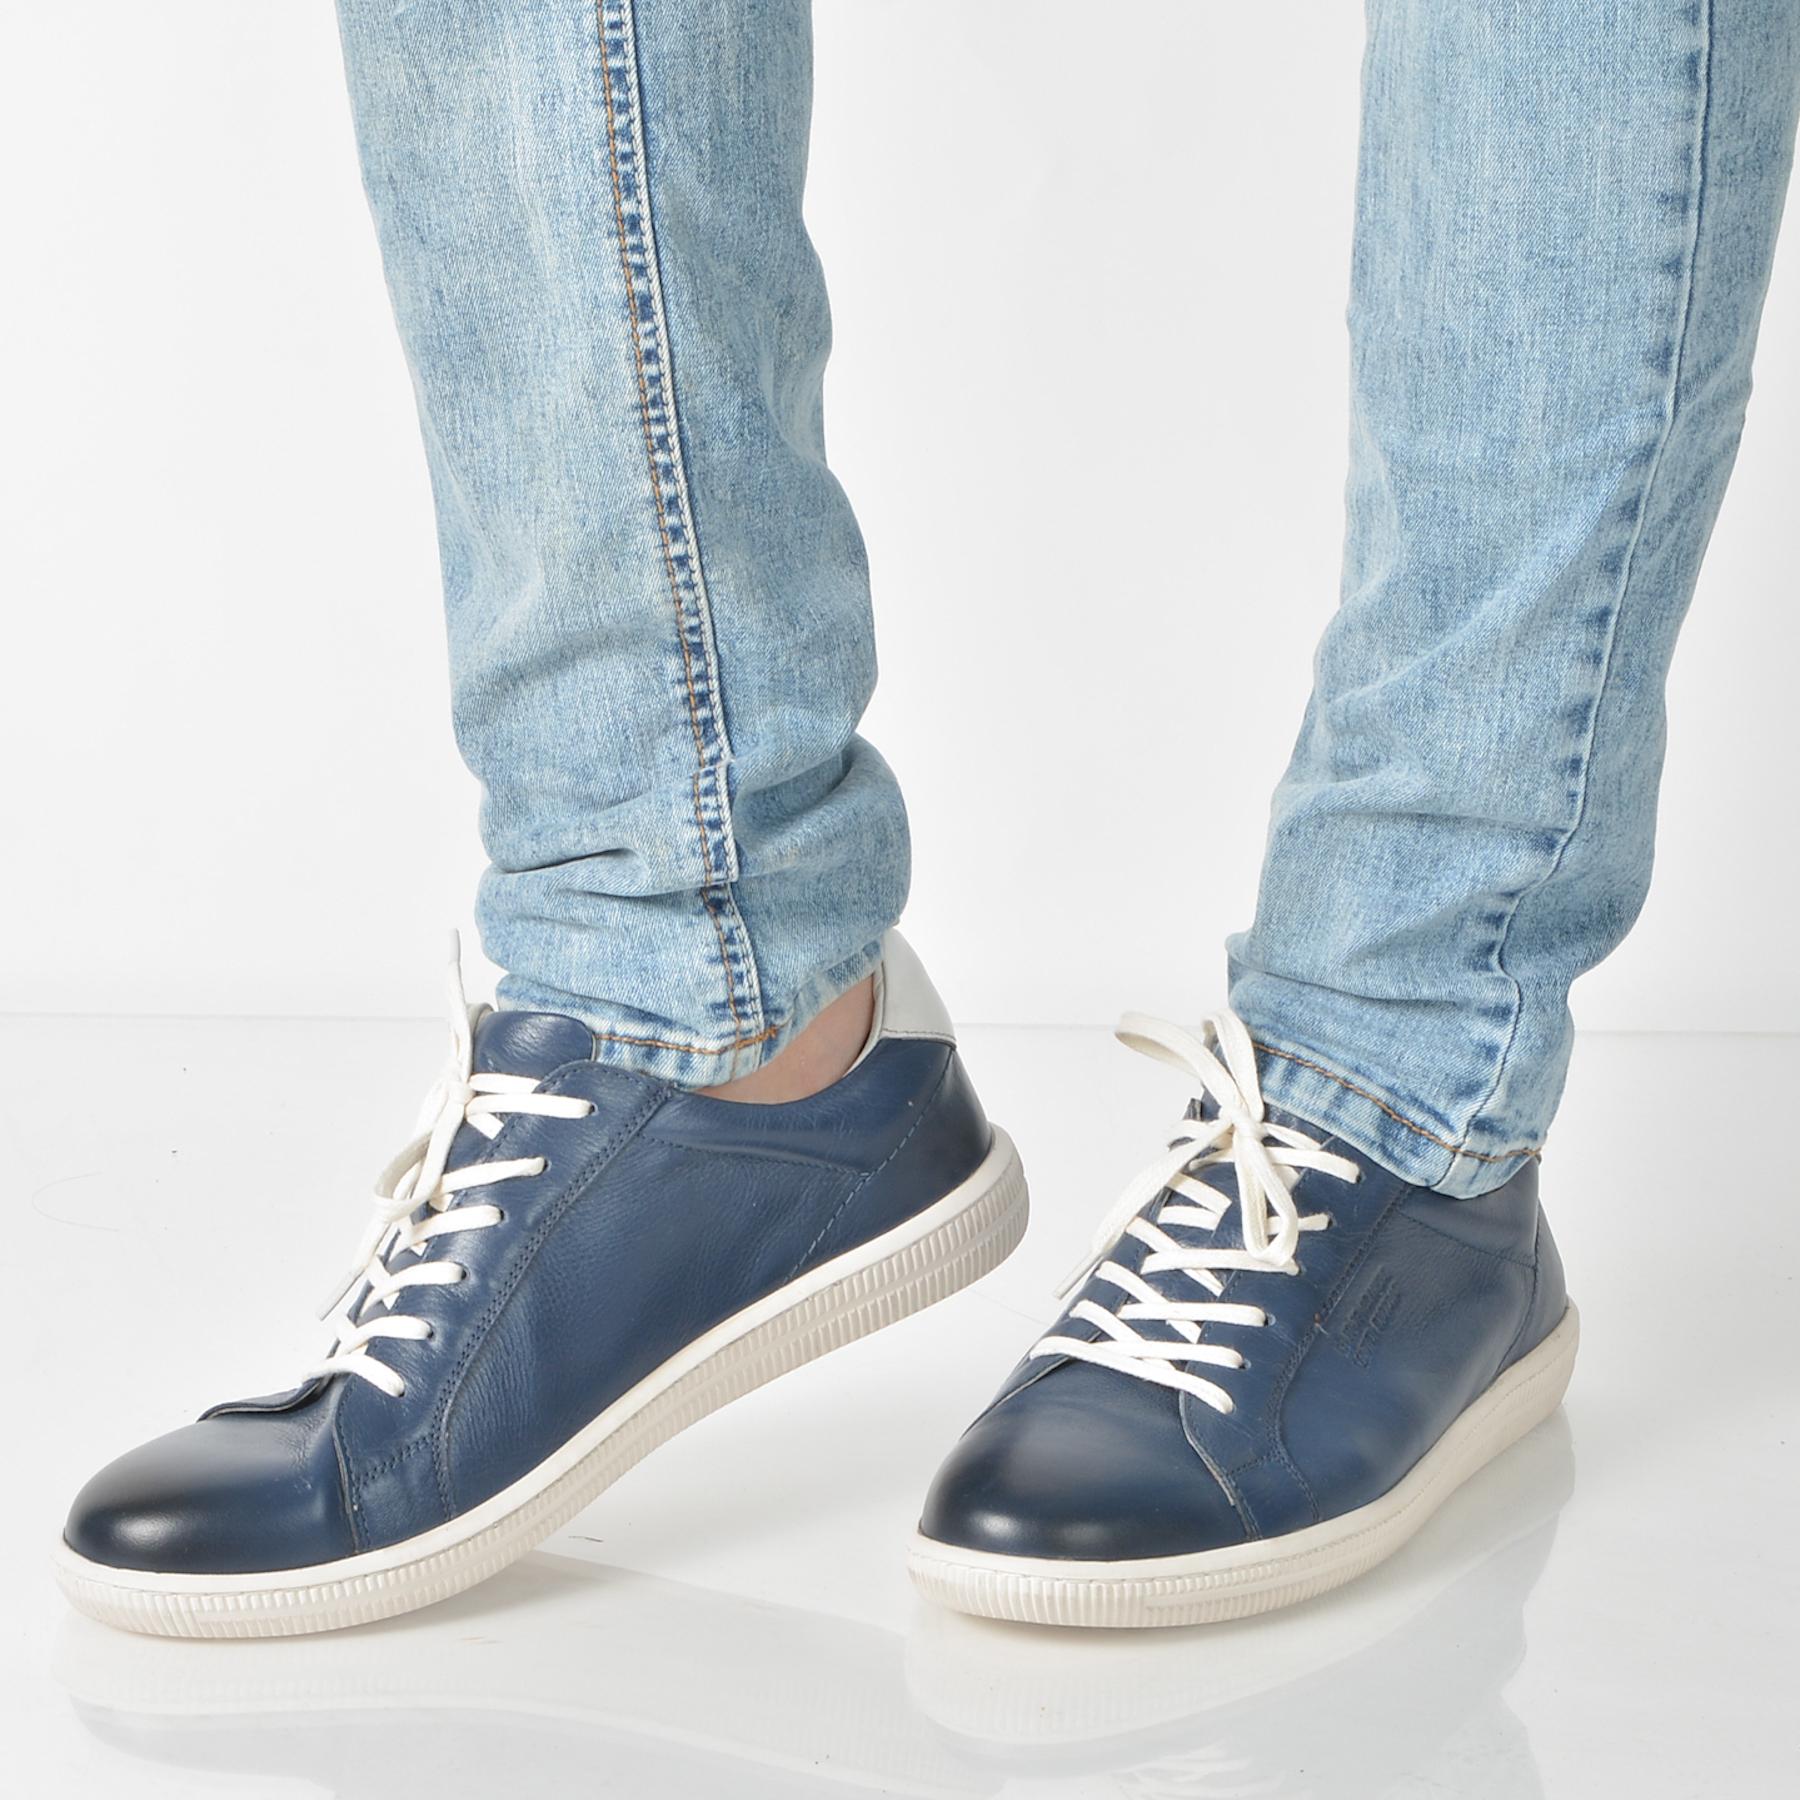 Pantofi Otter Bleumarin, 4240, Din Piele Naturala